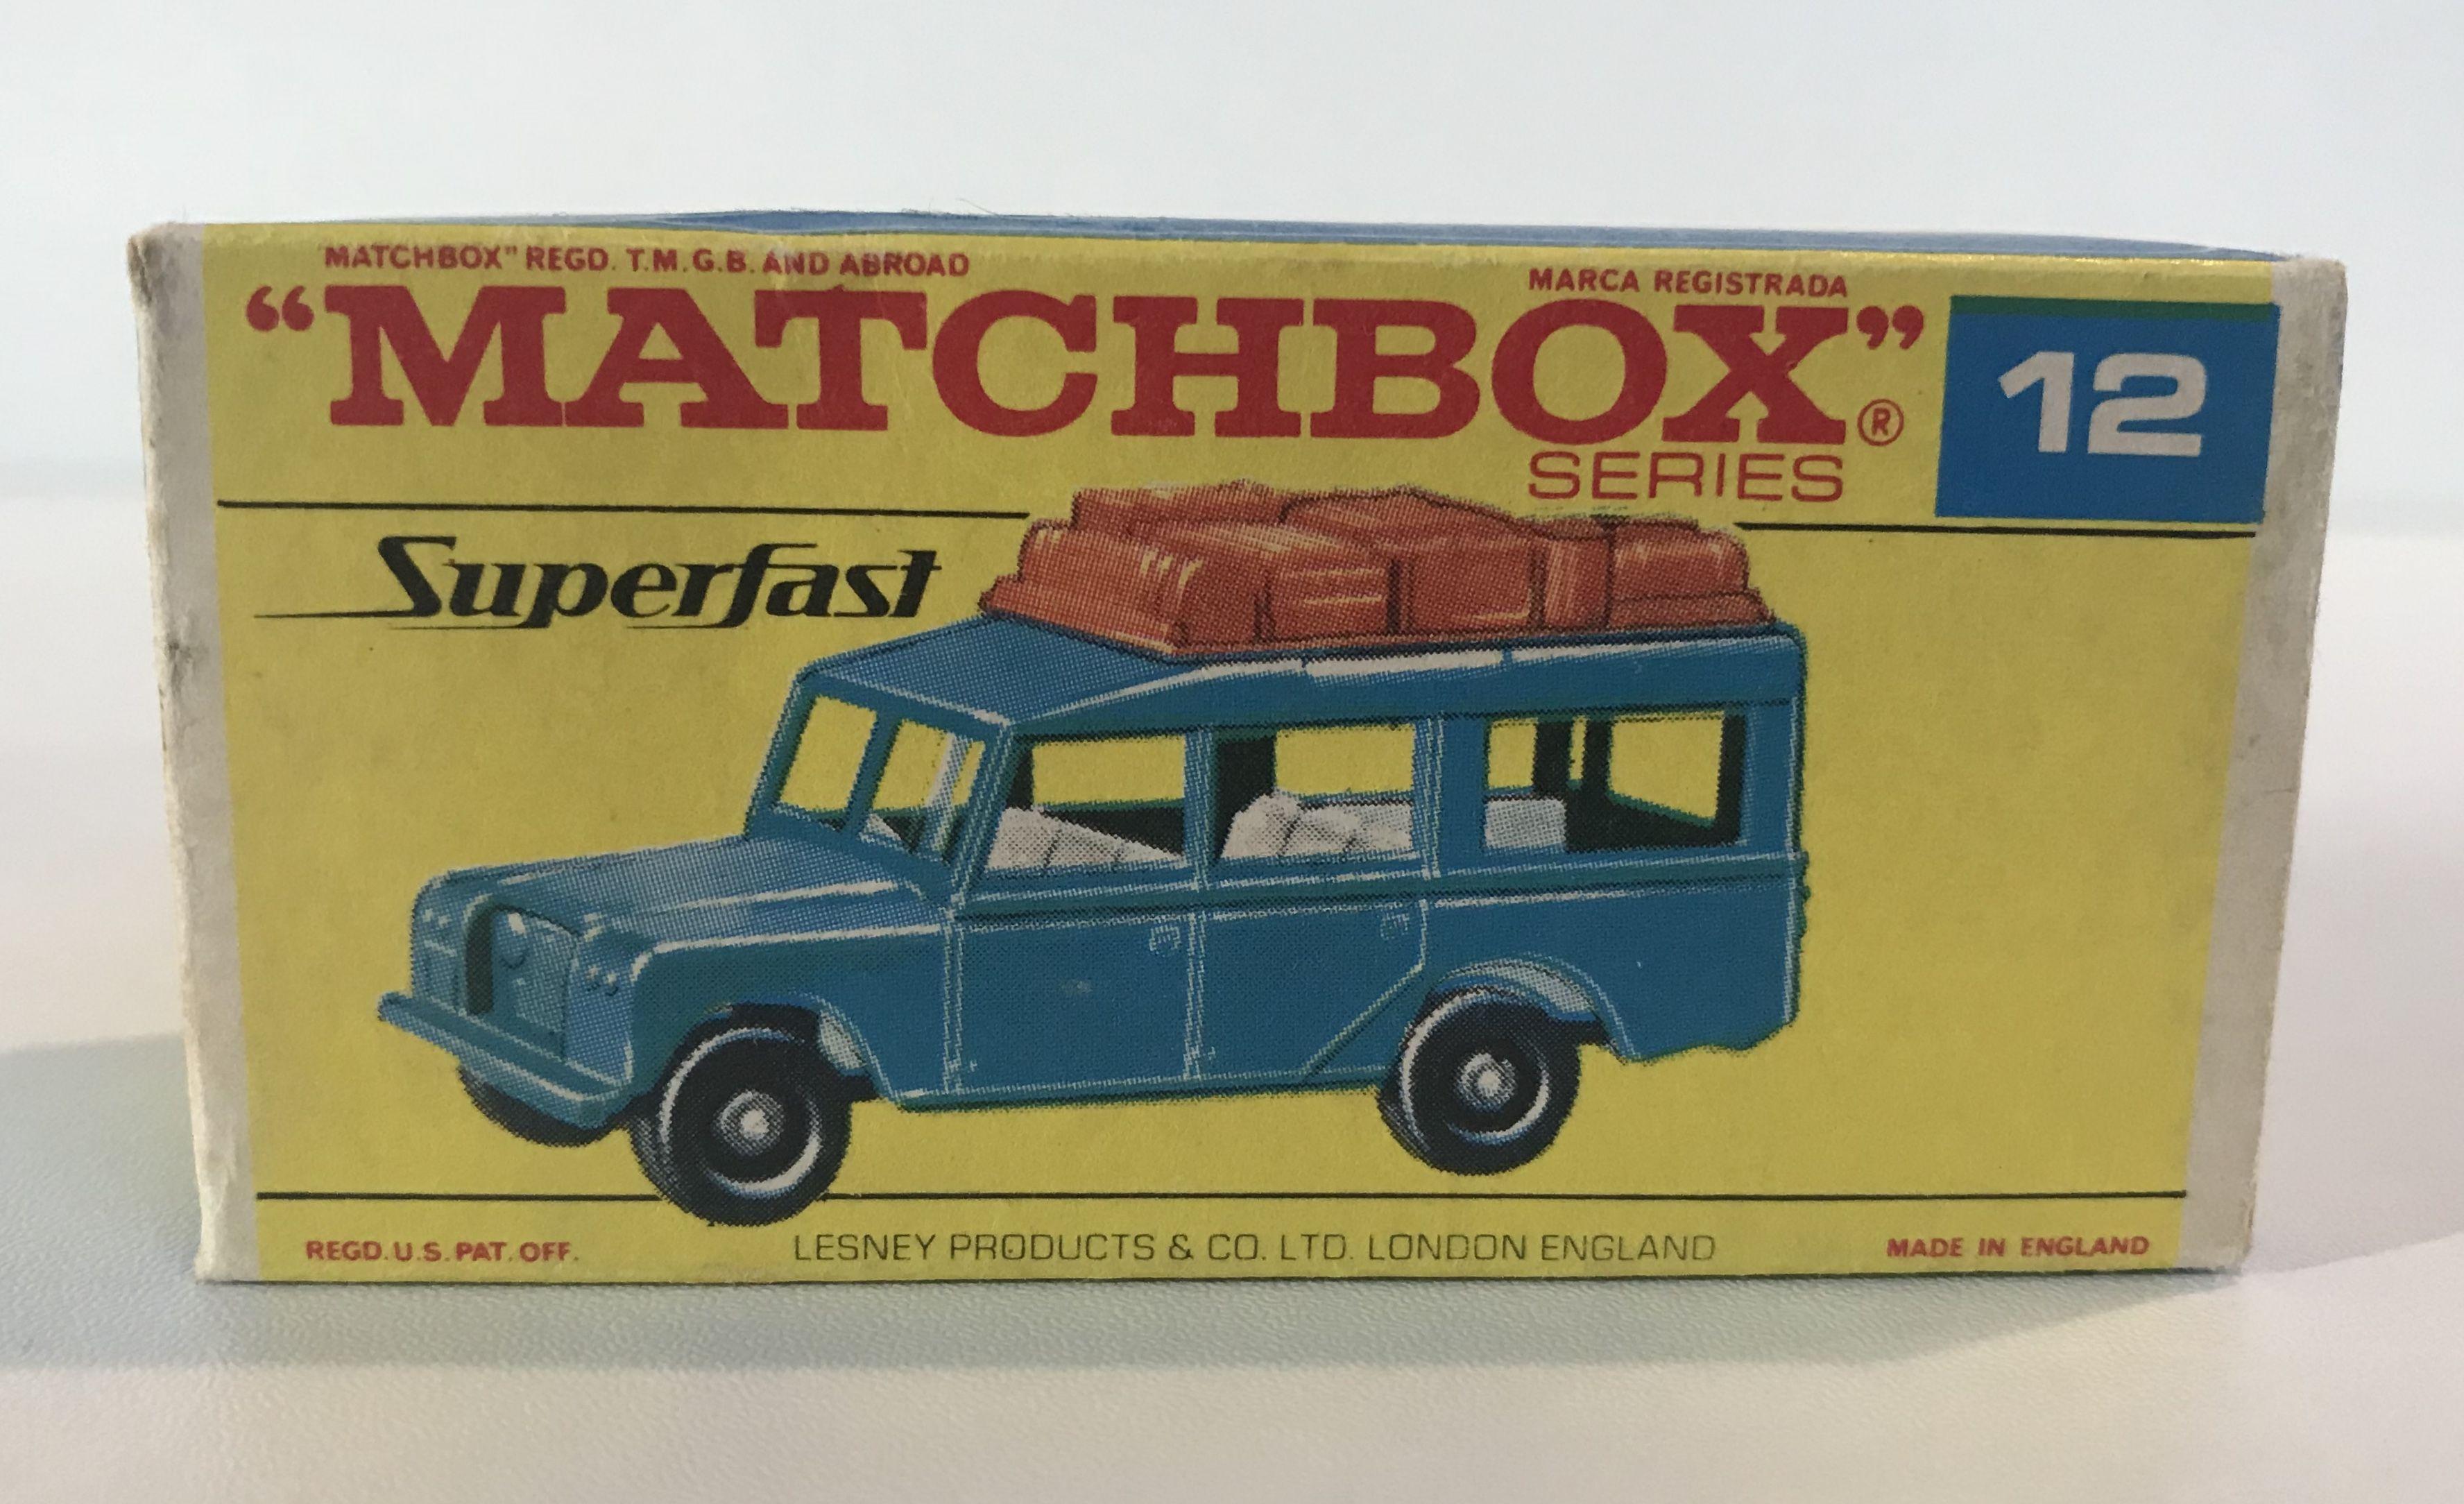 B toys car wheel  Pin by Igor Marinkovic on Matchbox  Pinterest